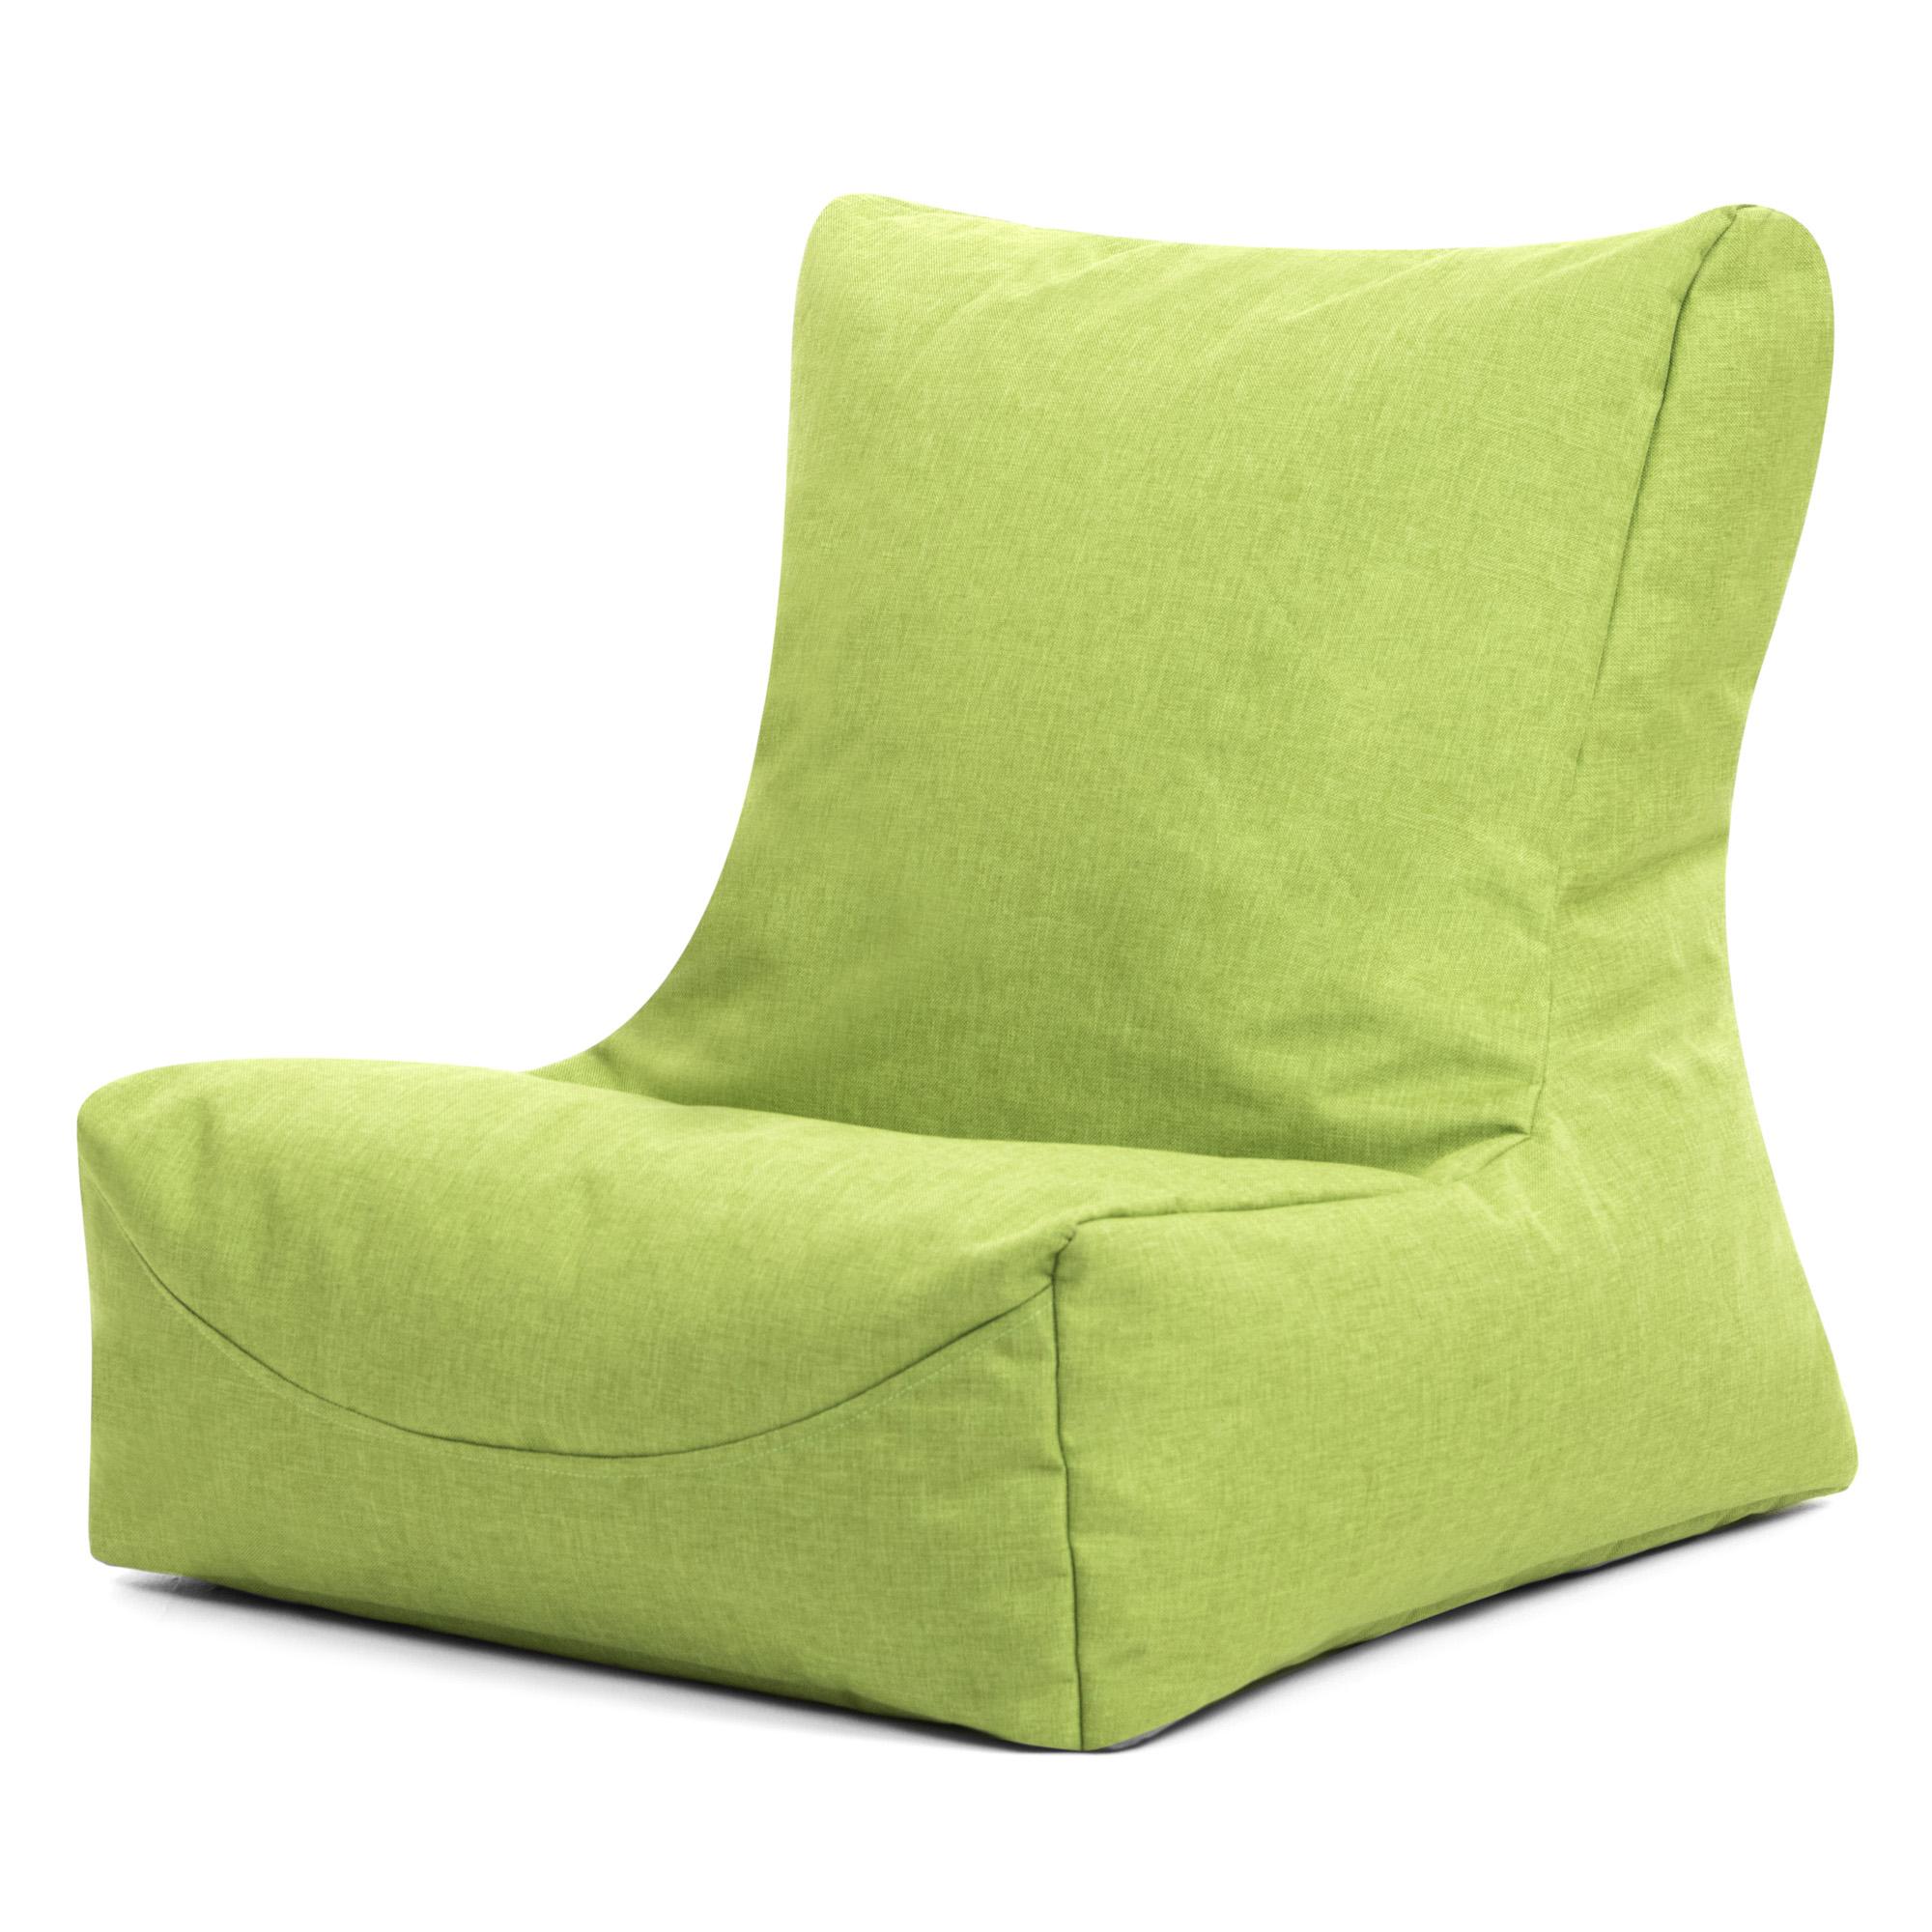 Eden-PRI-Smile-Chair-Lime-2-300dpi